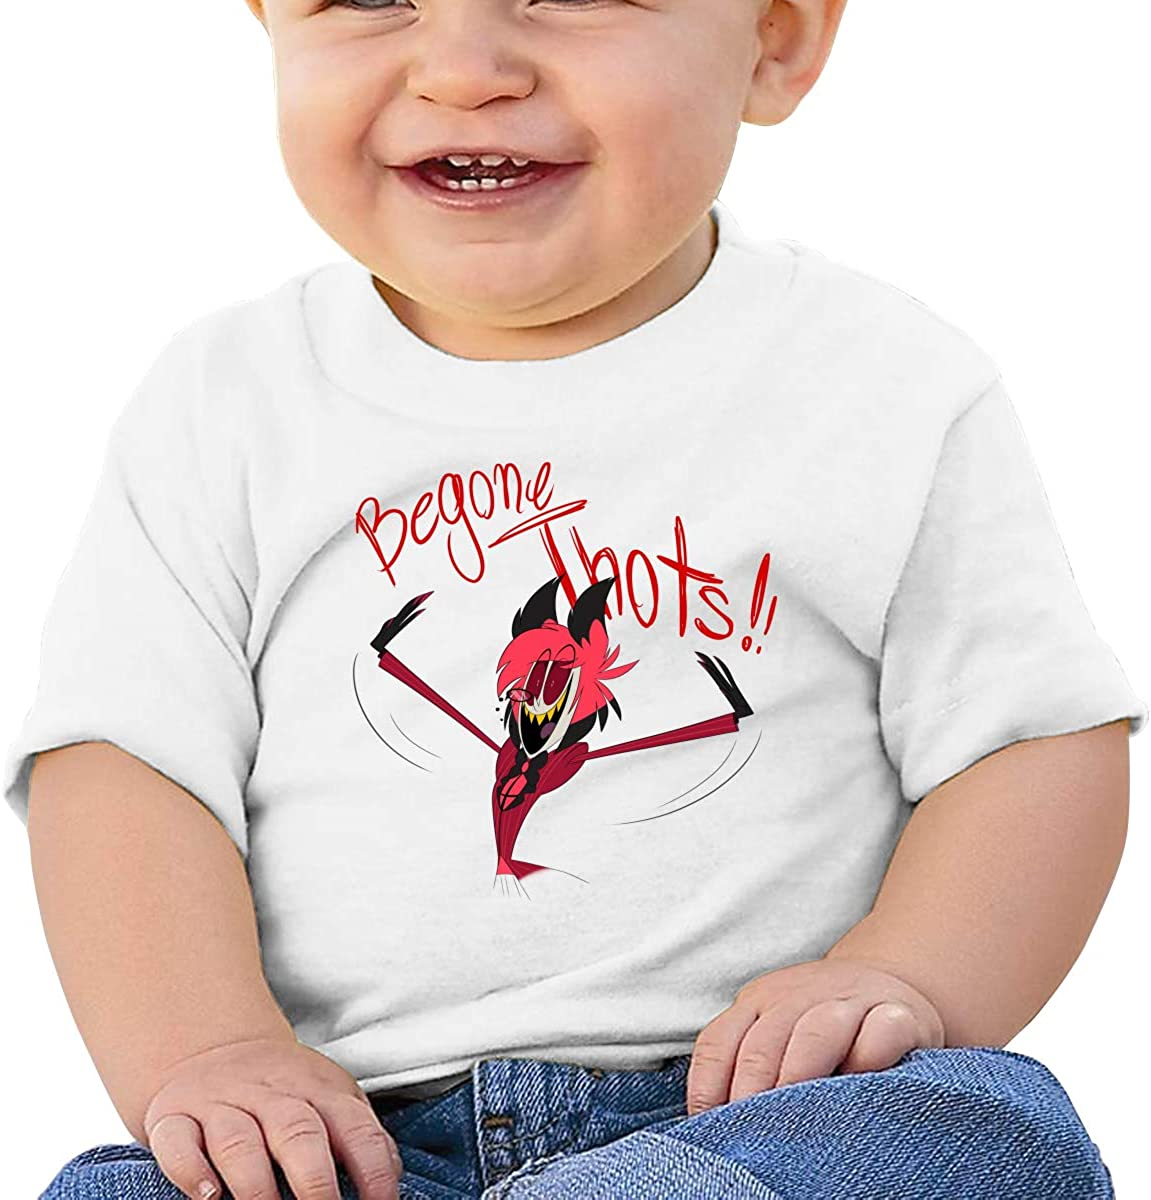 Kangtians Baby Hazbin Hotel Shirt Toddler Cotton Tee